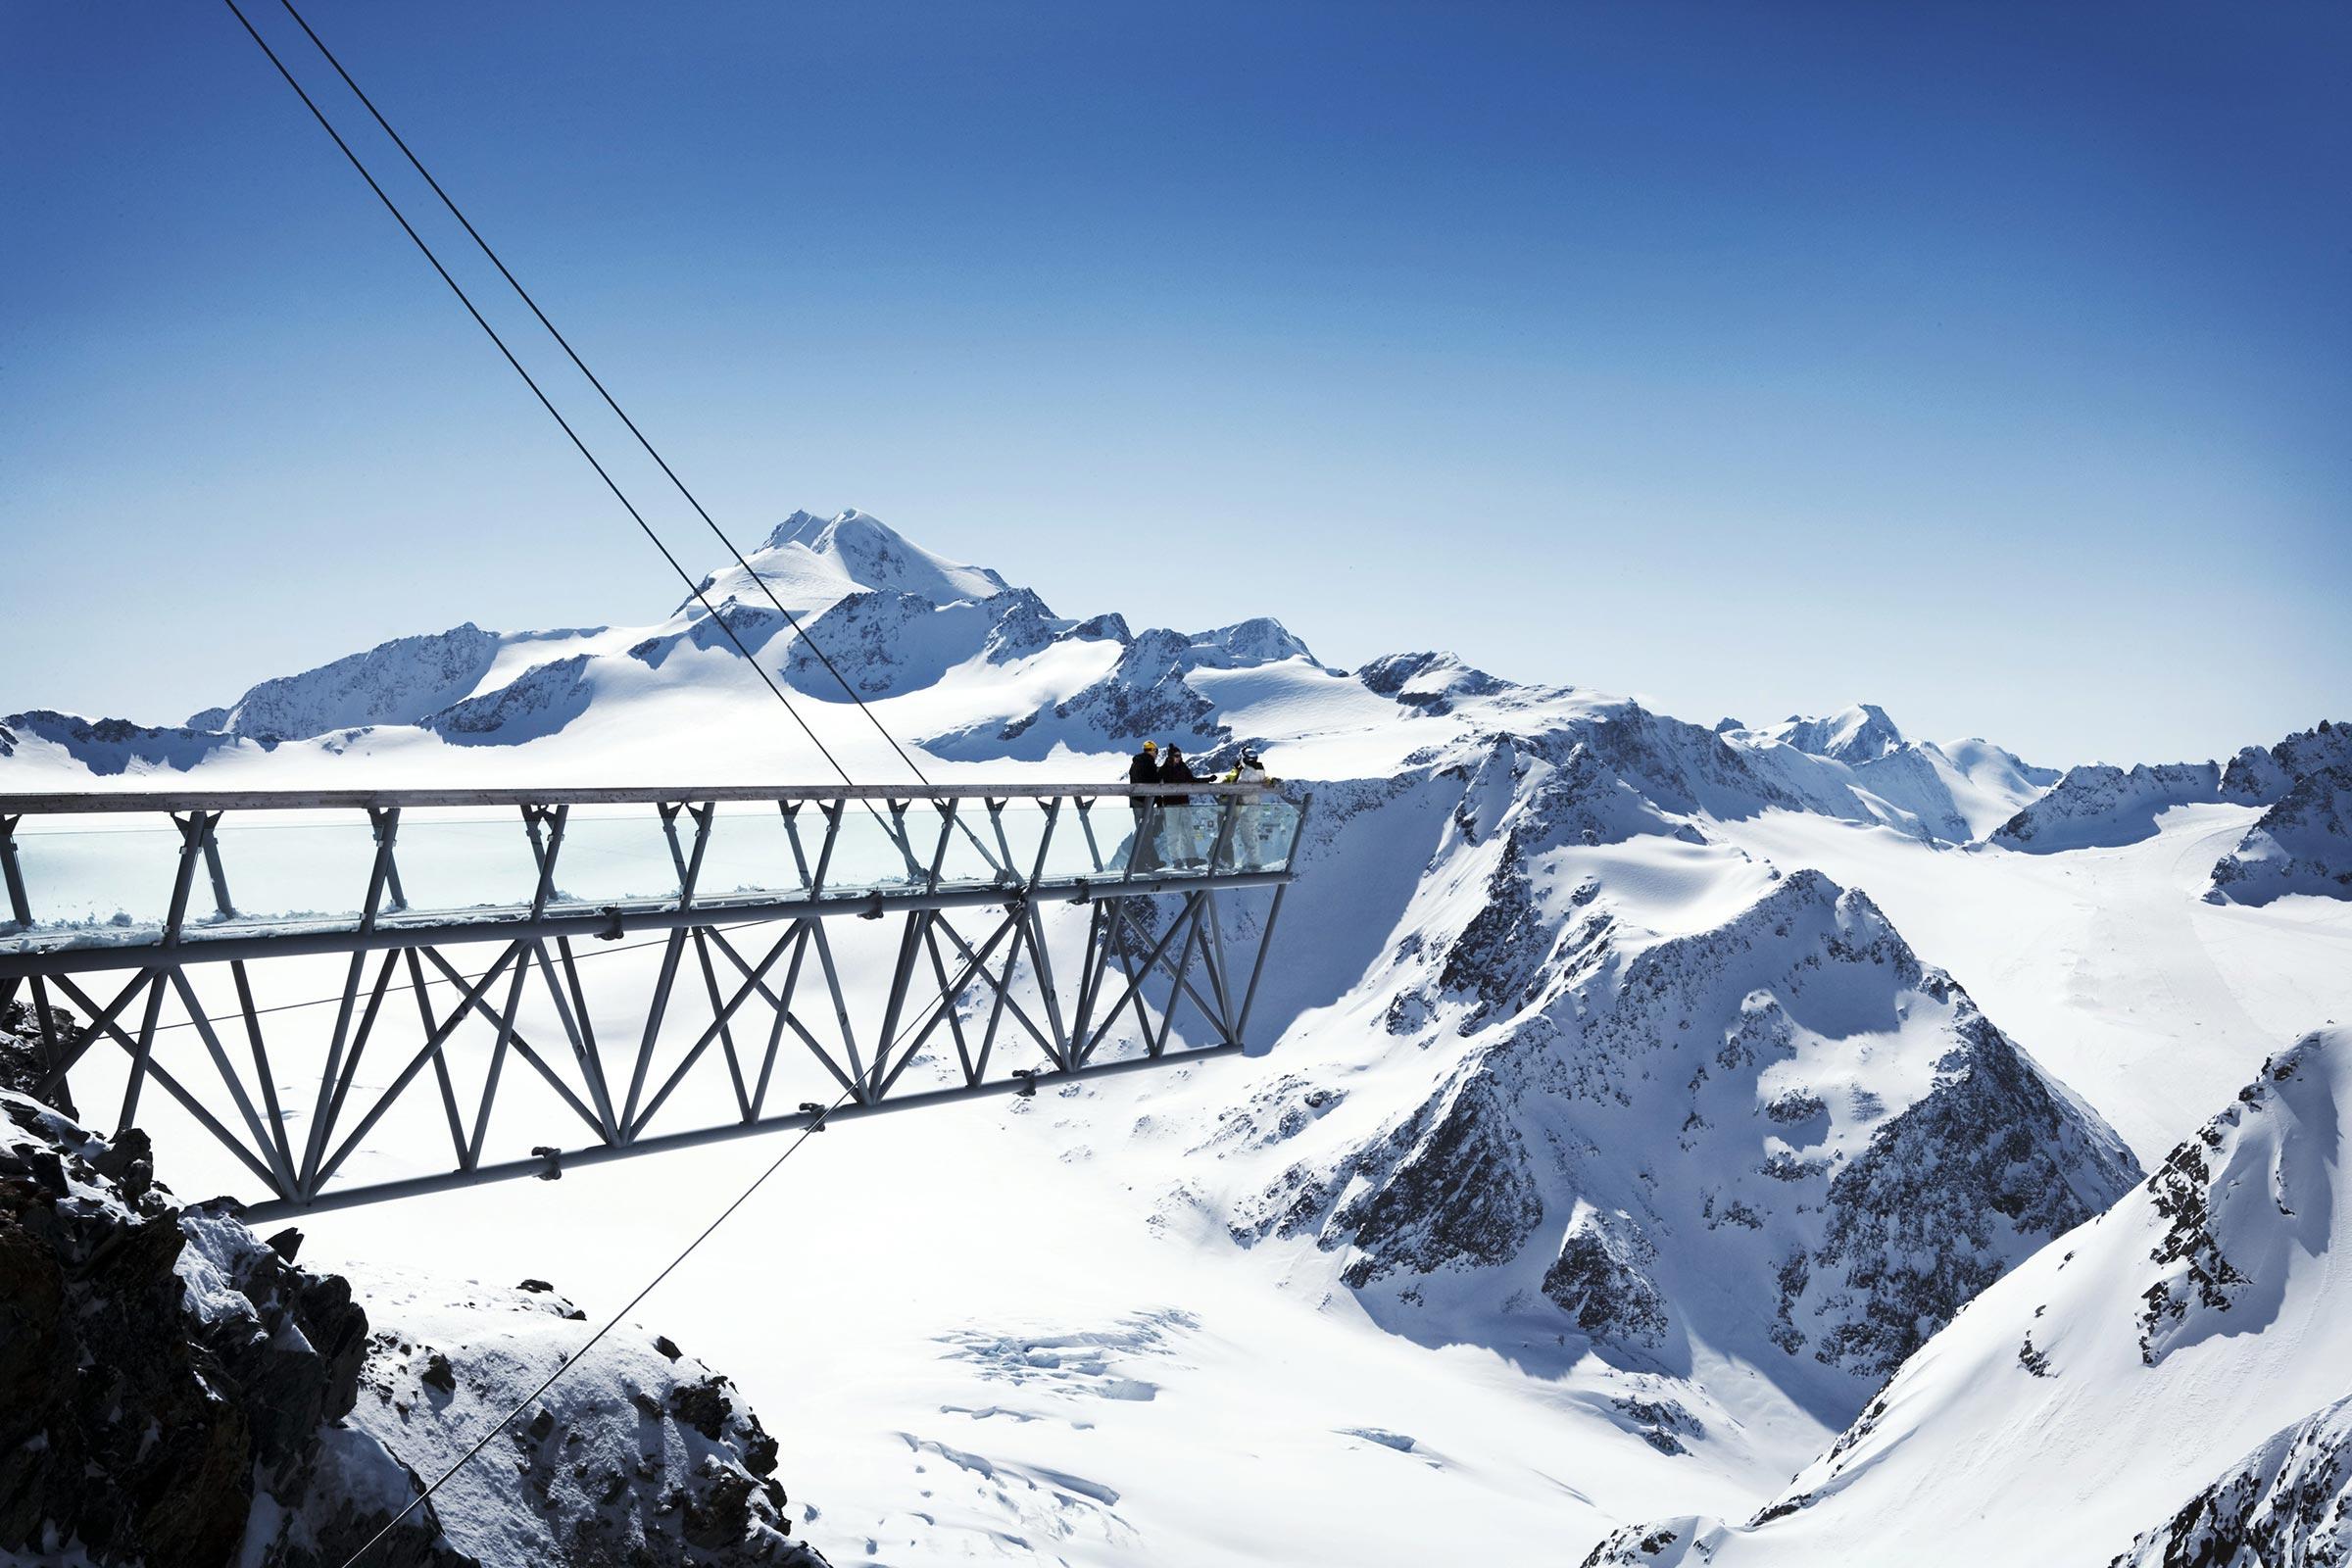 Steg Tiefenbachkogl - Skigebiet Sölden